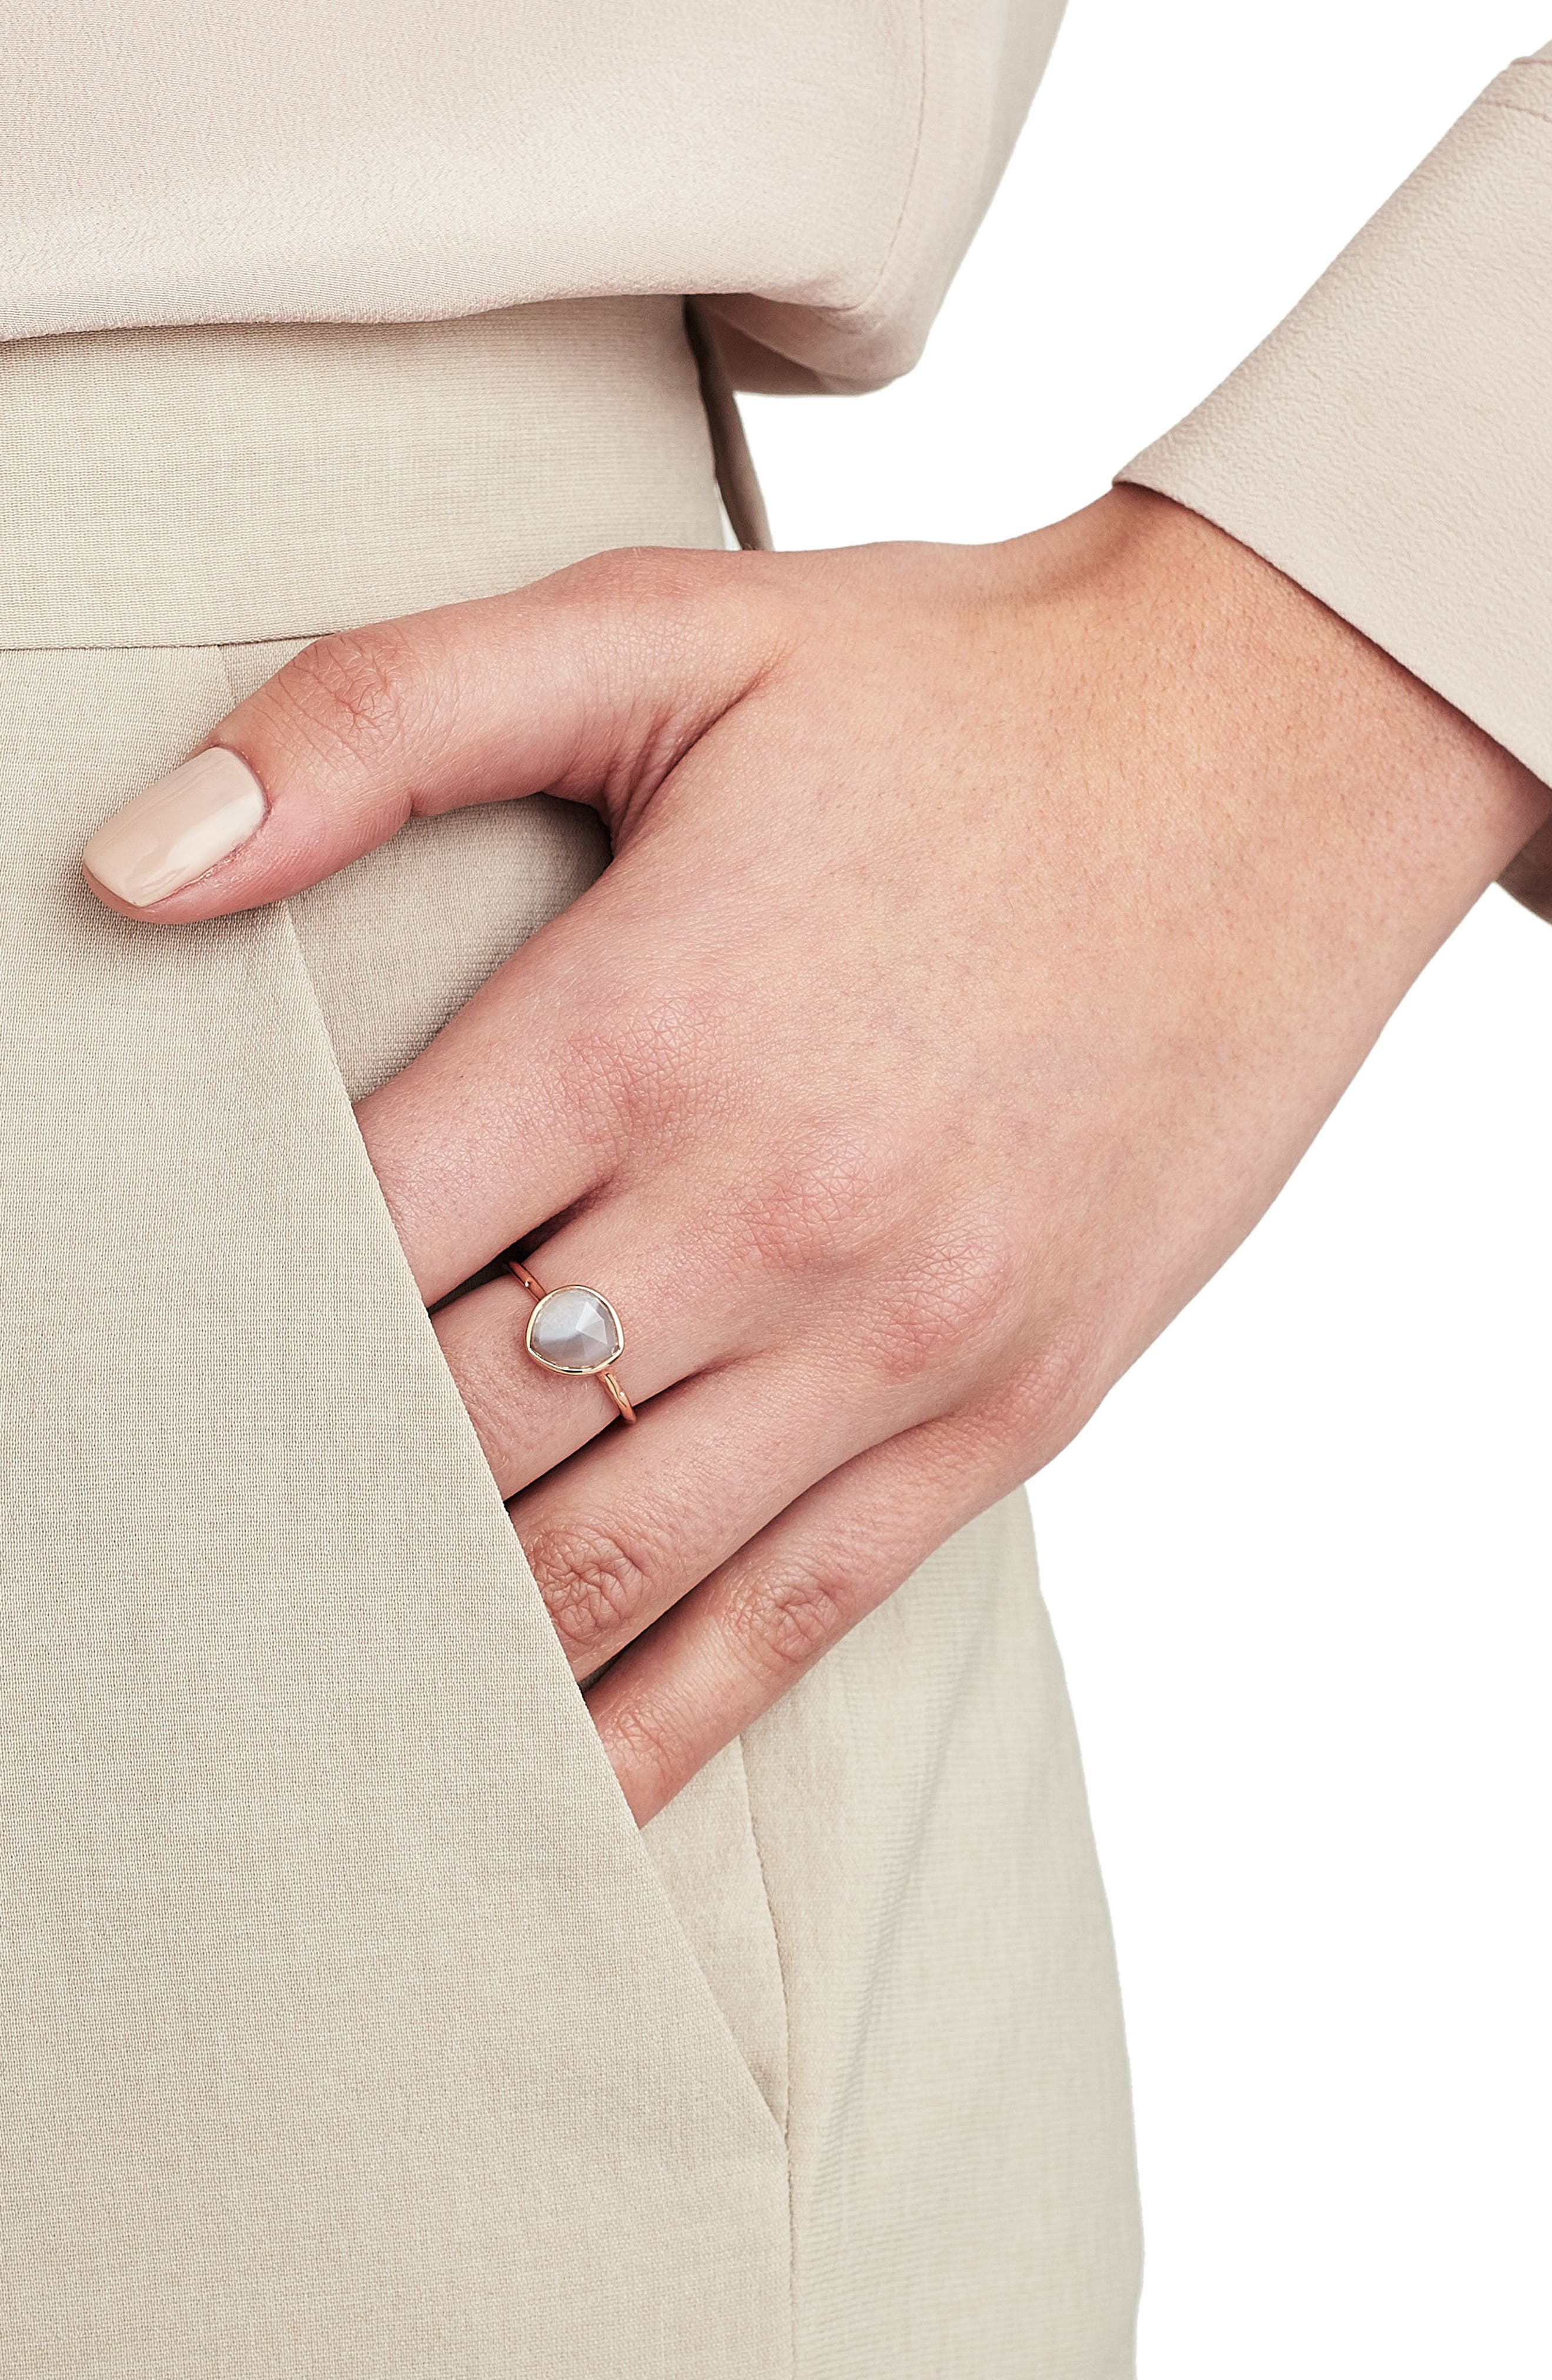 MONICA VINADER, Siren Semiprecious Stone Stacking Ring, Alternate thumbnail 7, color, ROSE GOLD/ KYANITE